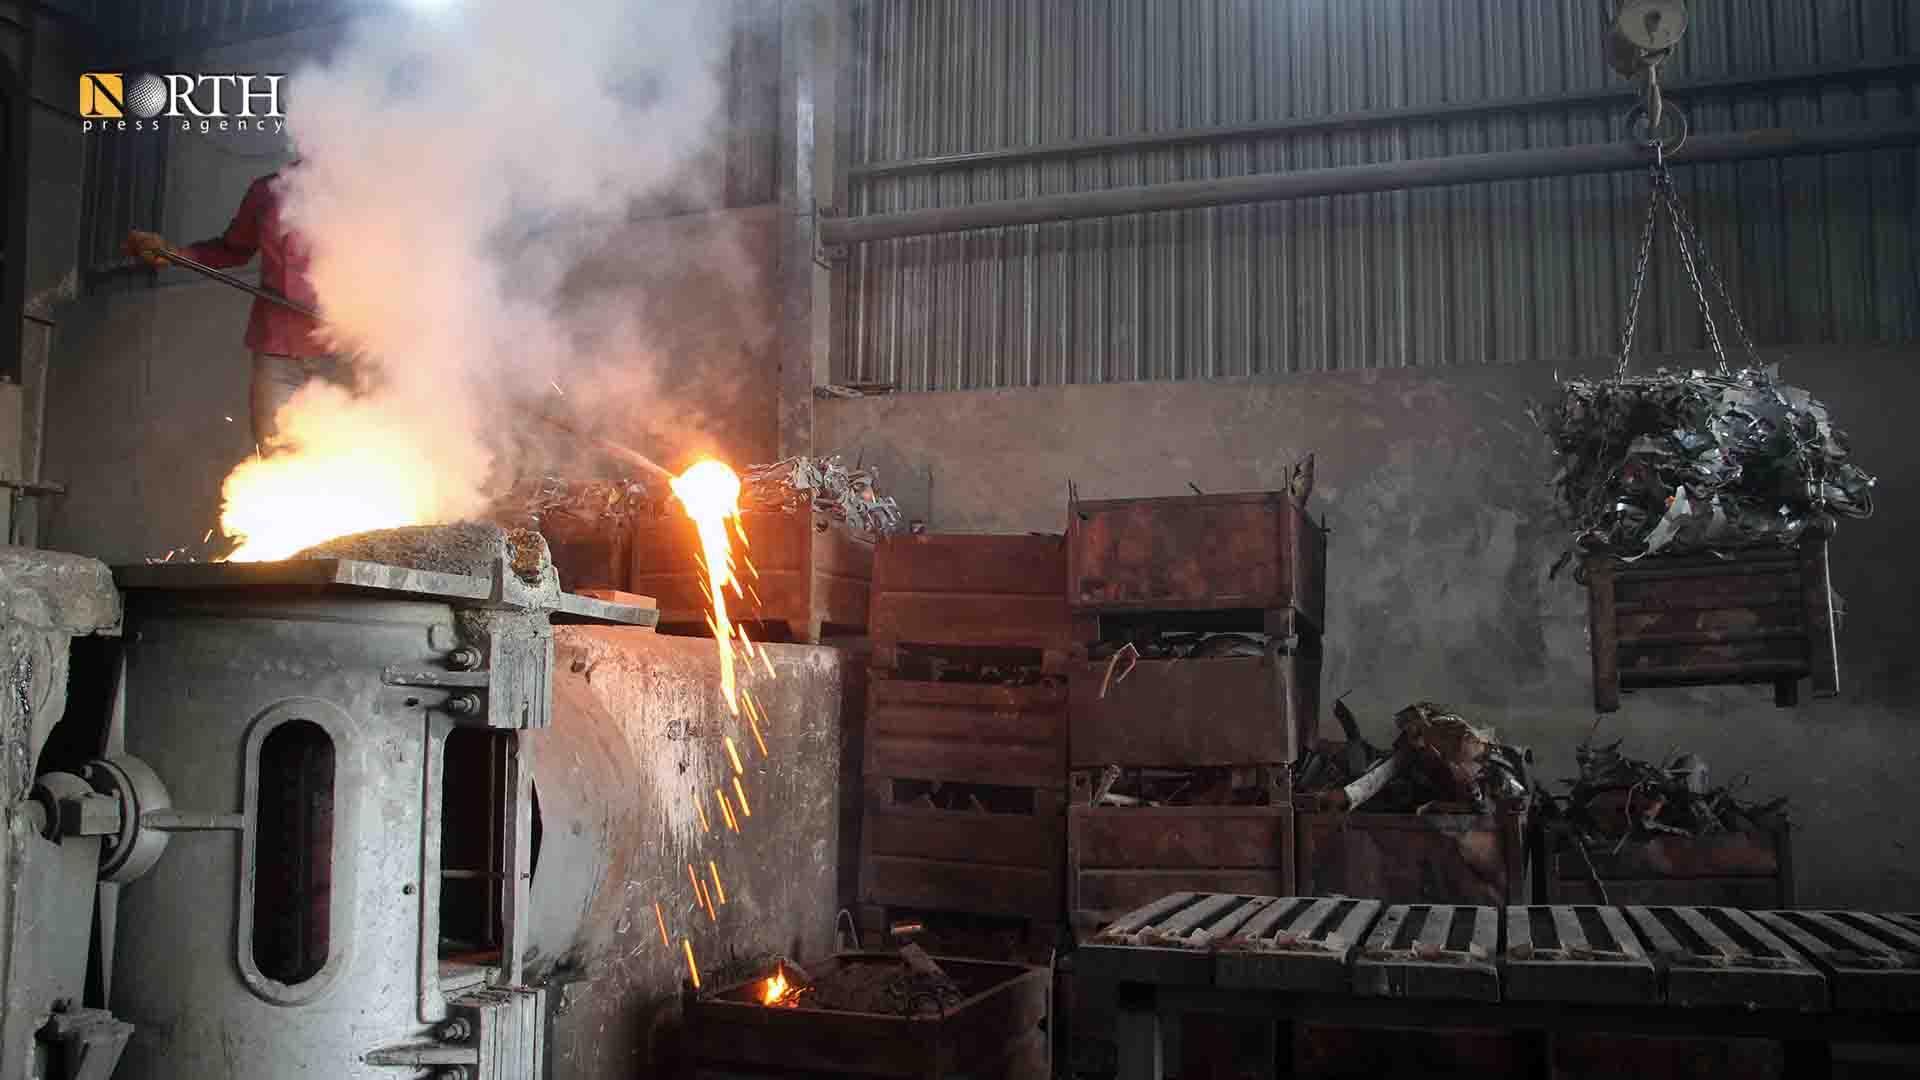 Manbij – Abdal al-Sham for Iron and Steel factory – North Press